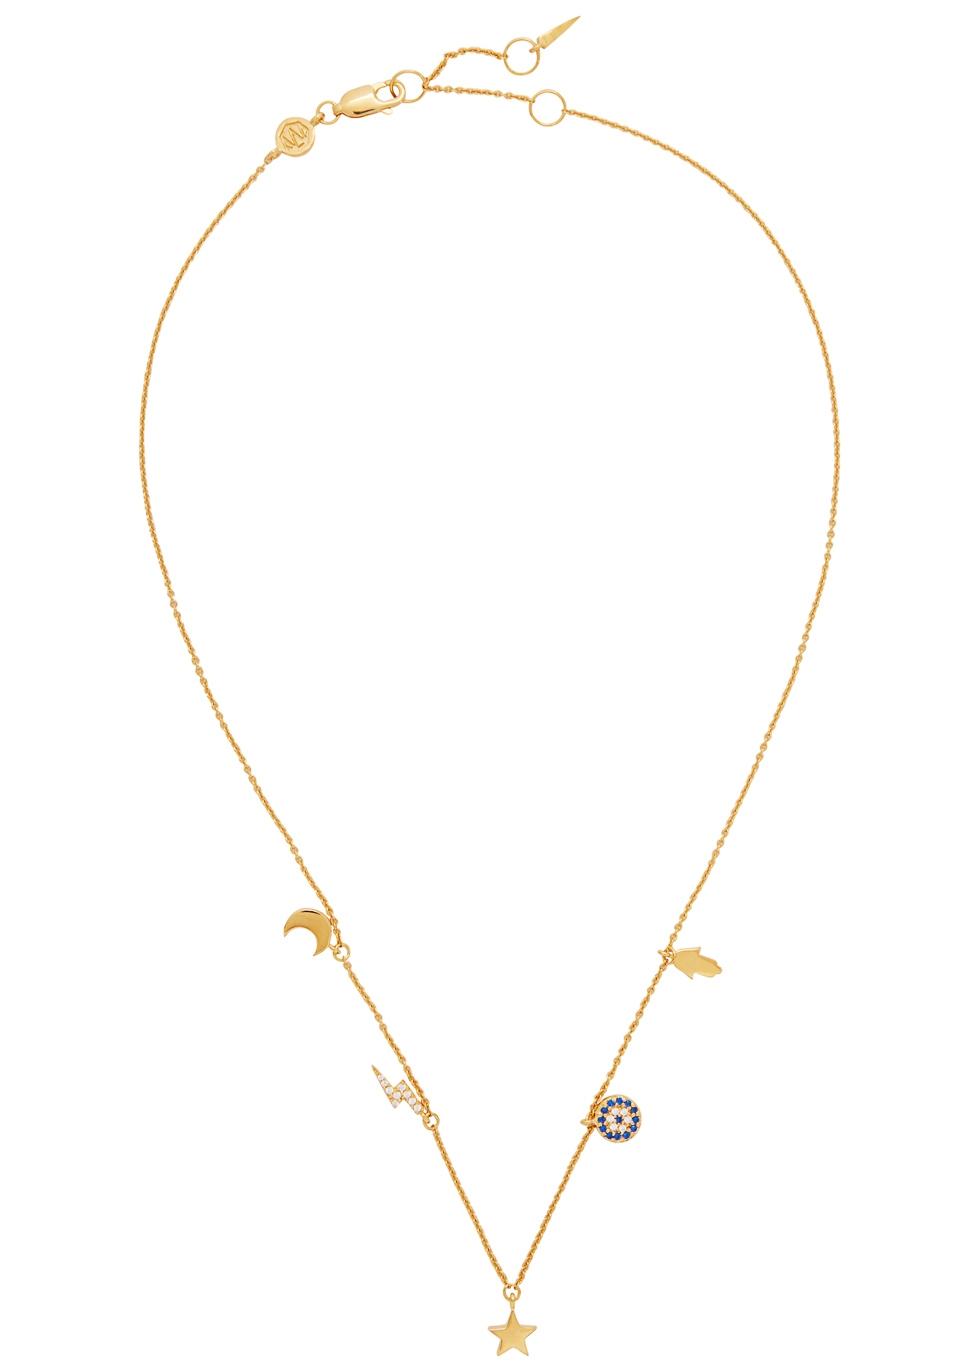 MISSOMA Elemental 18Ct Gold Vermeil Necklace